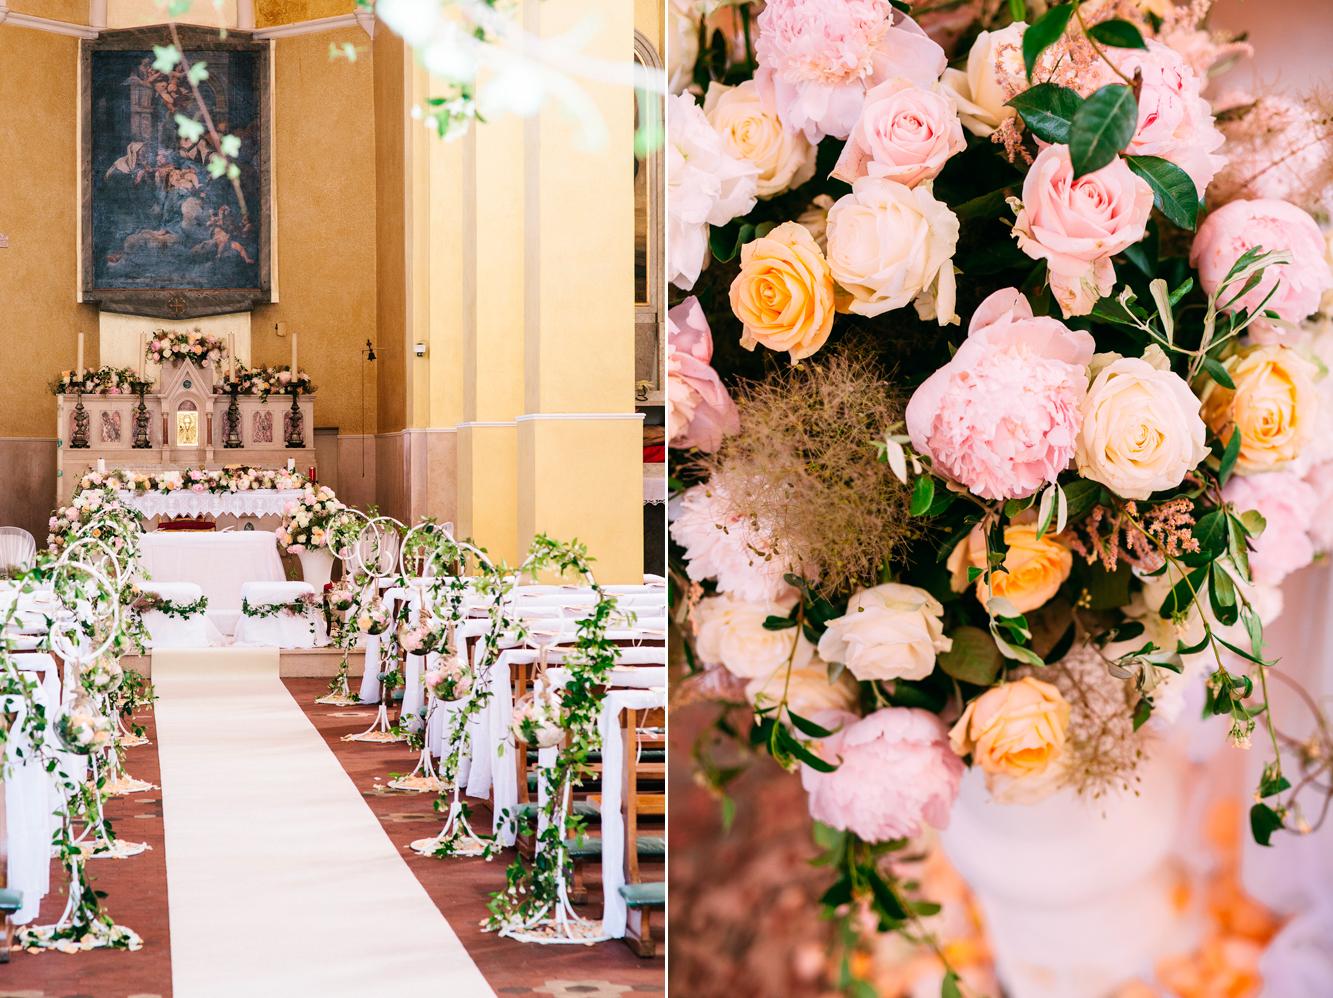 080-chiesa sant' anna matrimonio church porto potenza wedding.jpg